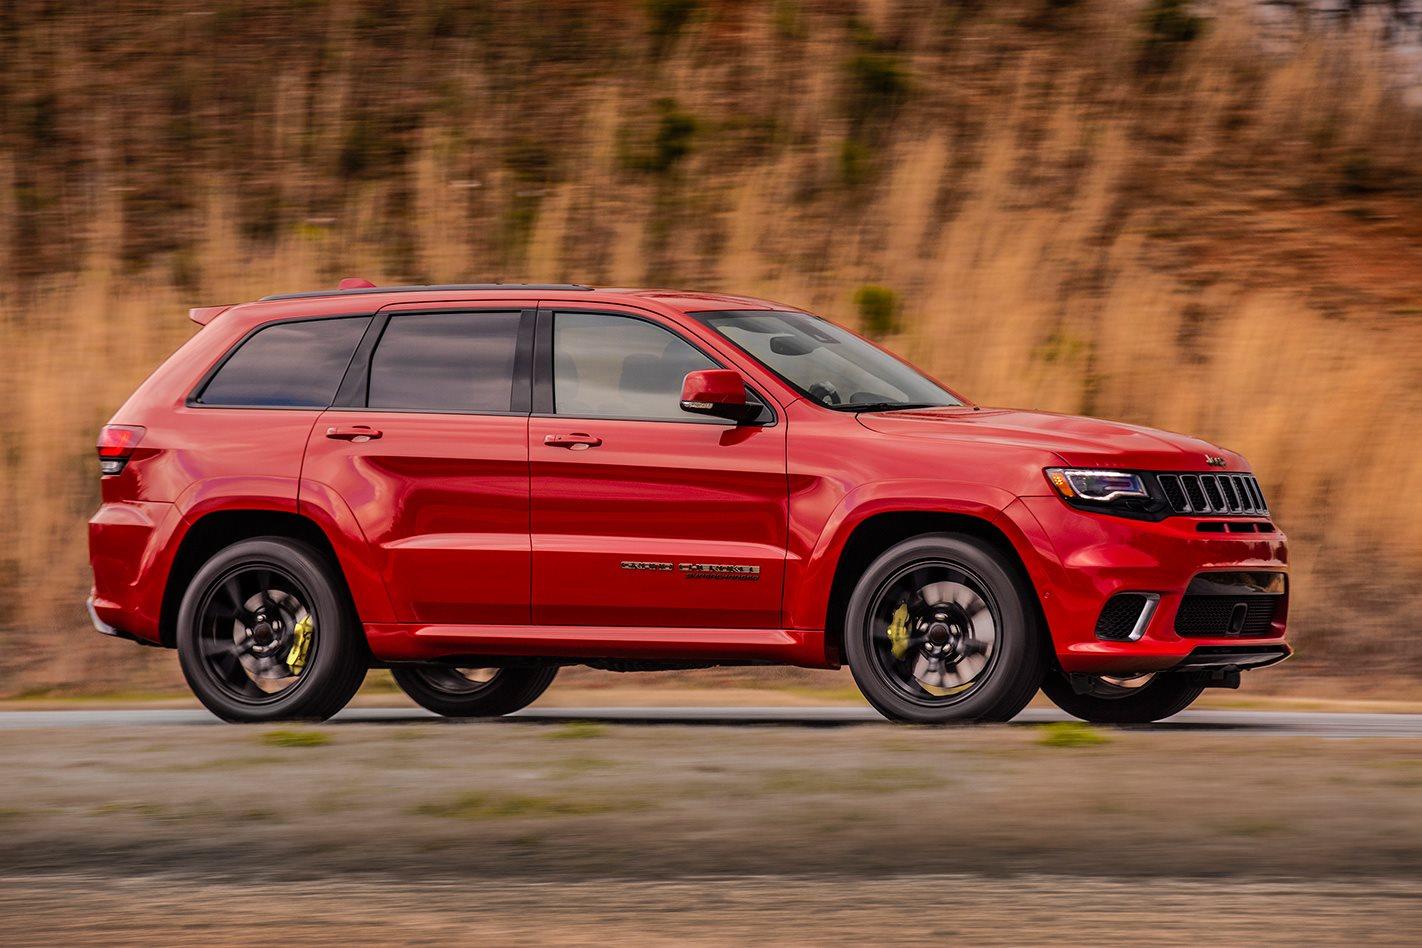 2018 Jeep Grand Cherokee Trackhawk exterior.jpg